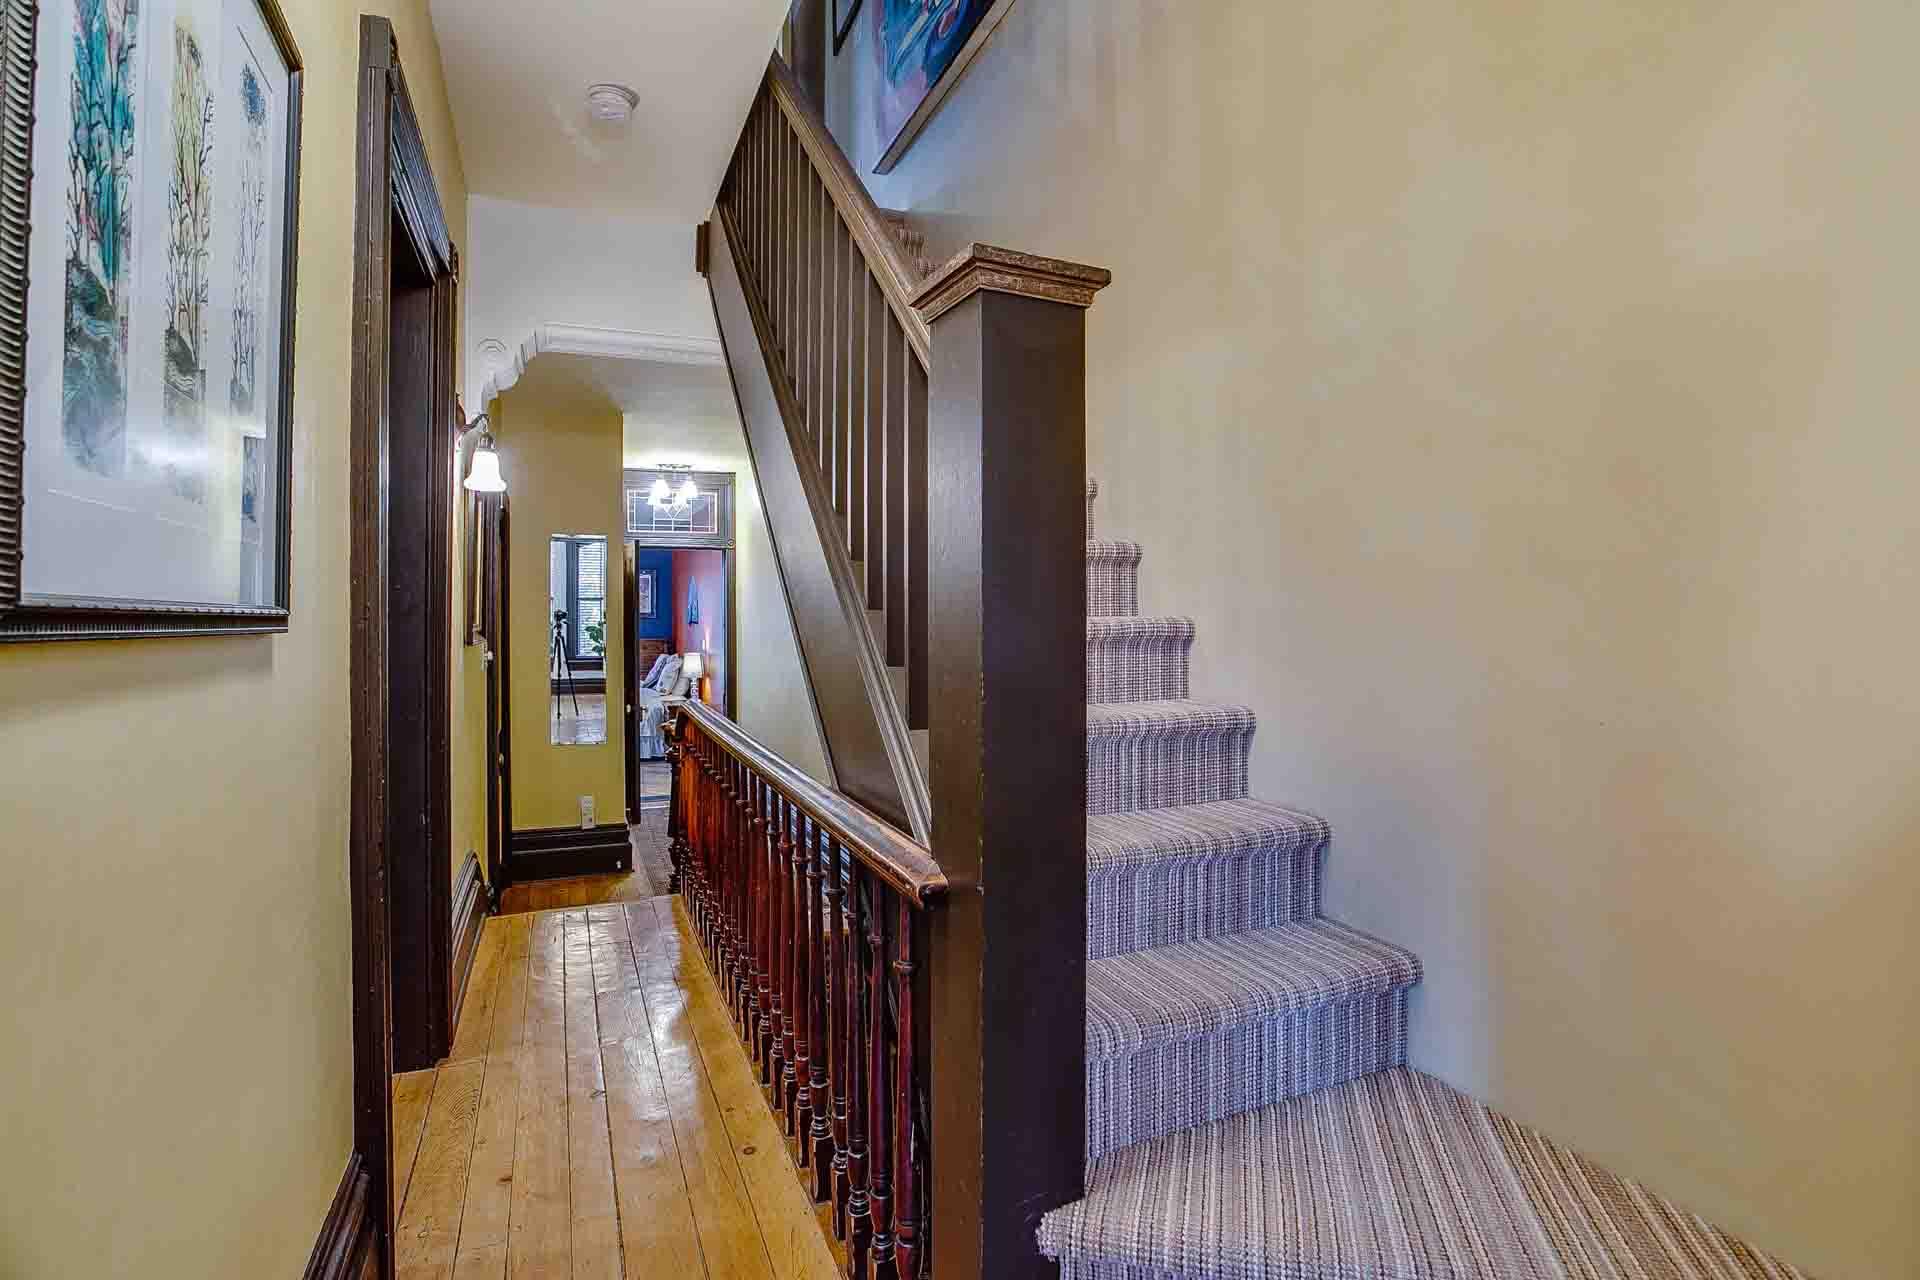 39_upper_hallway_2